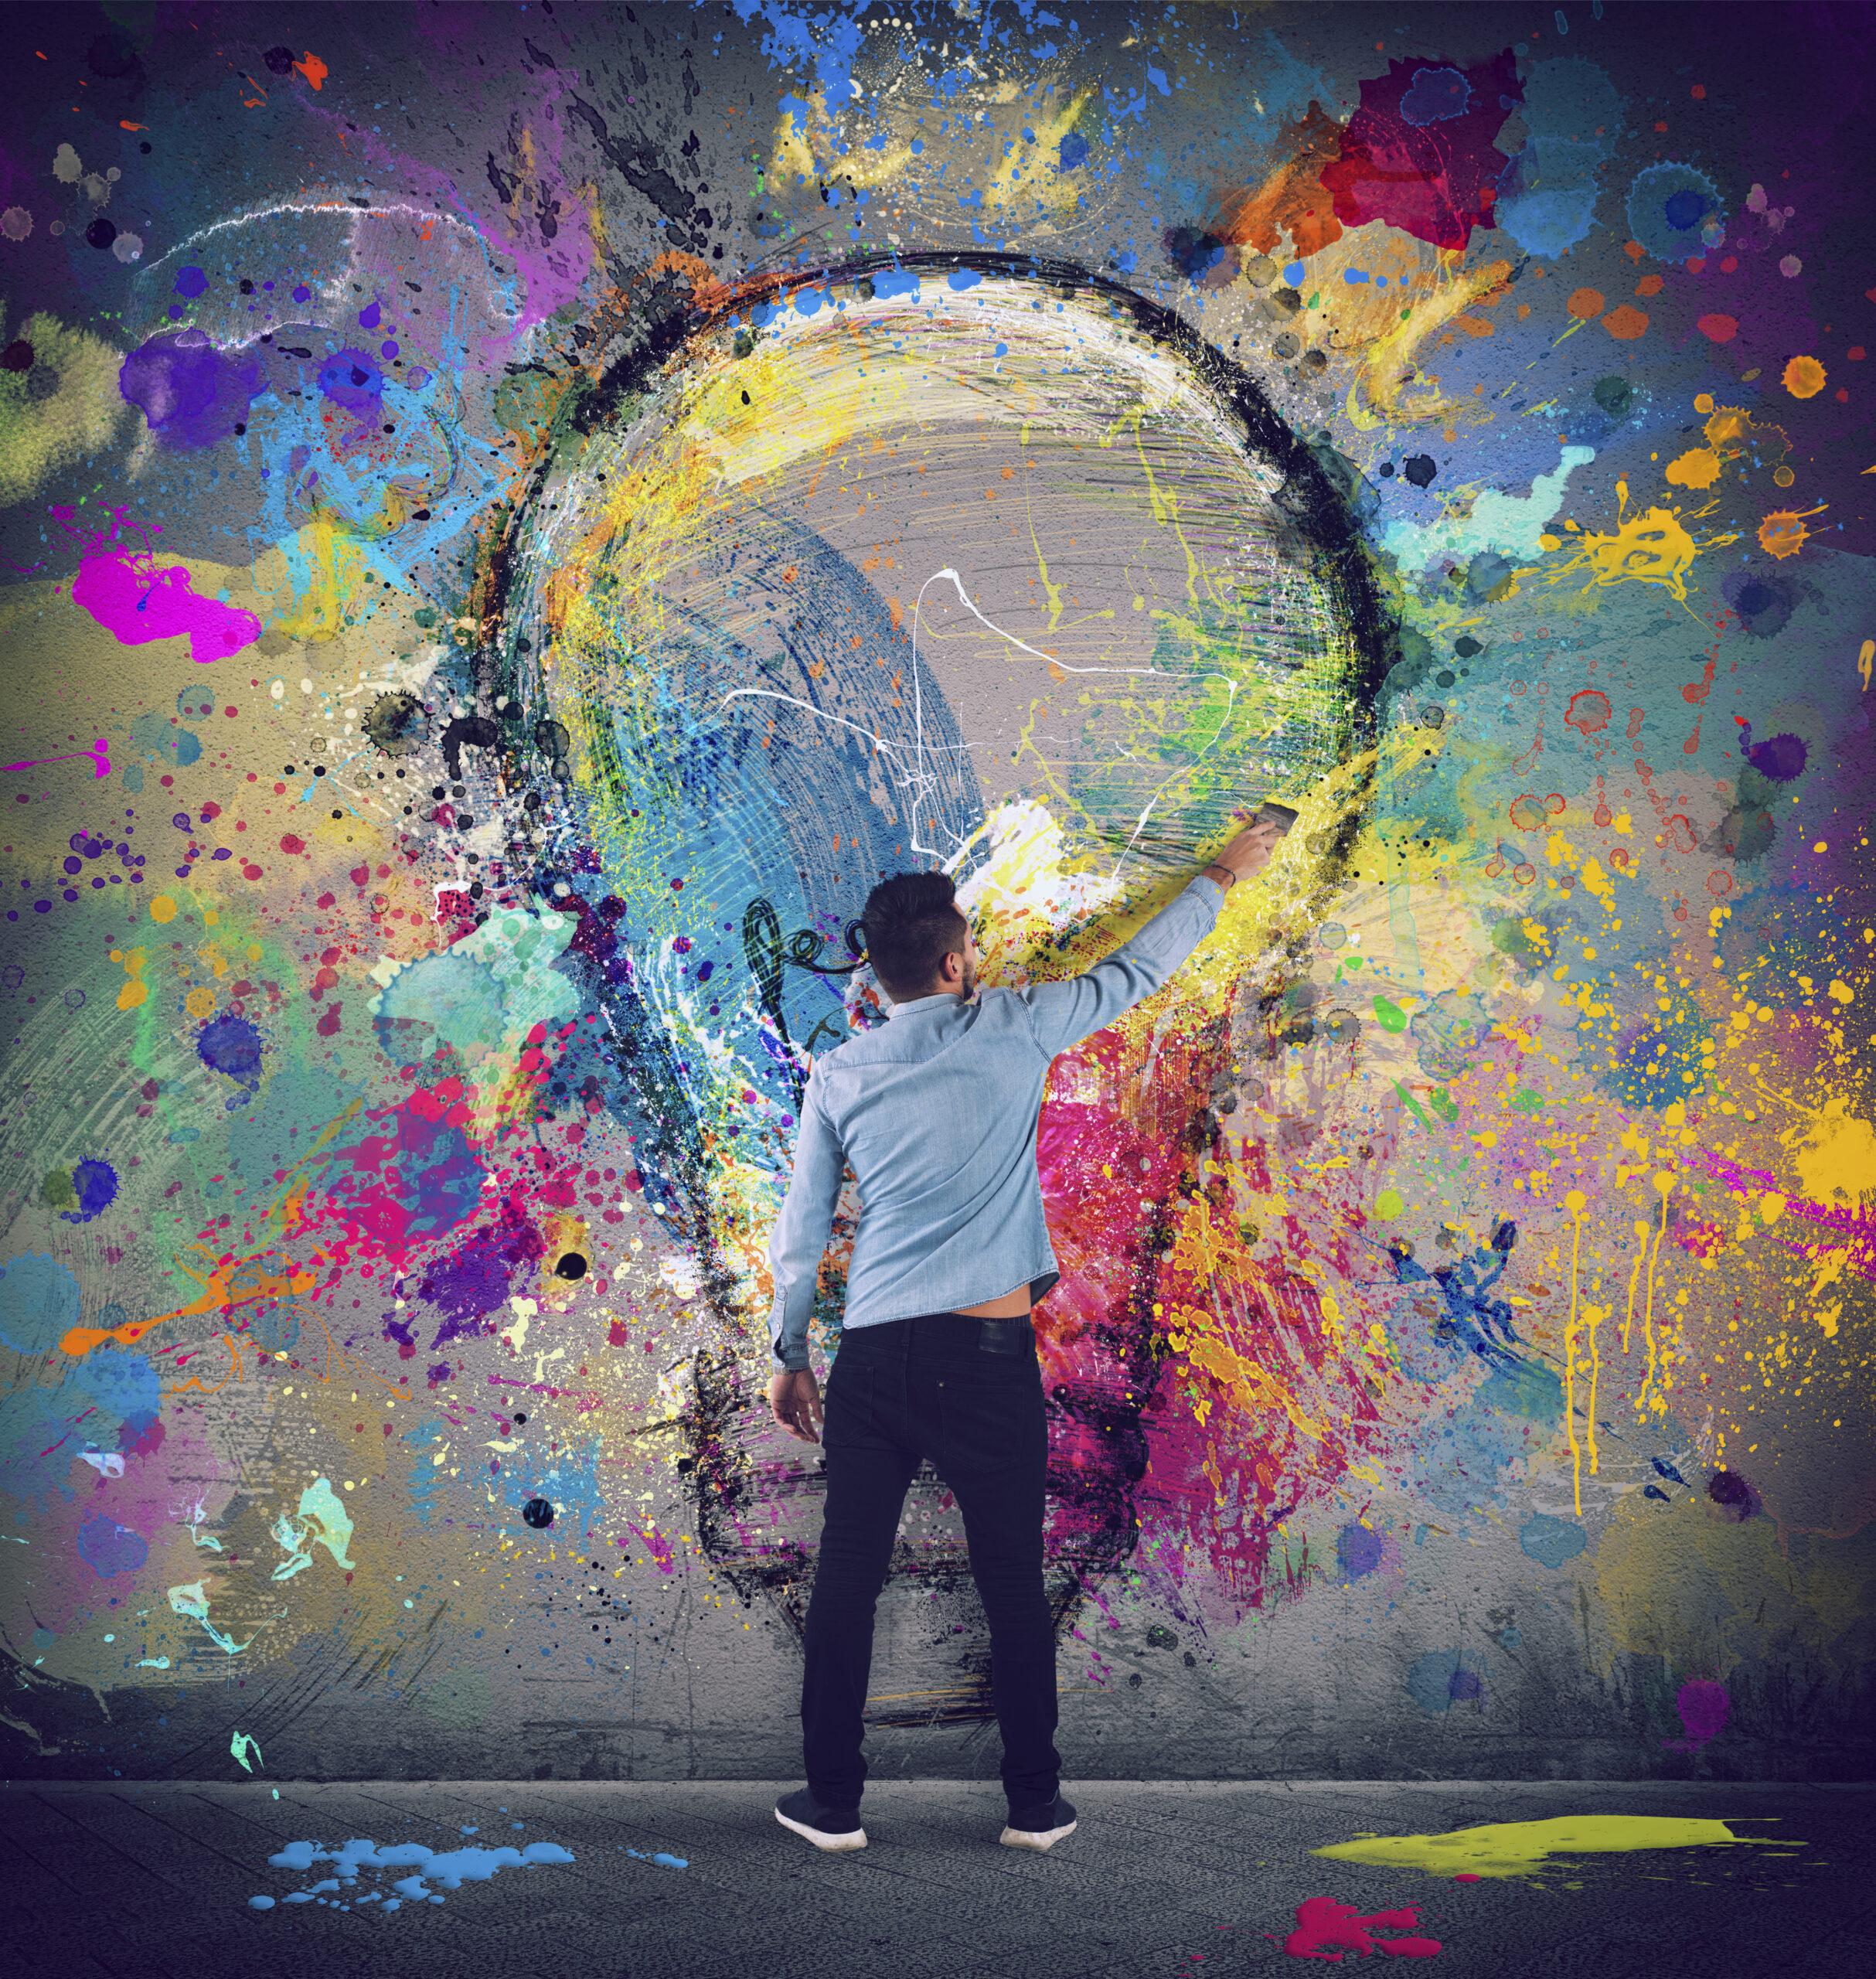 Enneagram type 4 – Intense Creatieveling